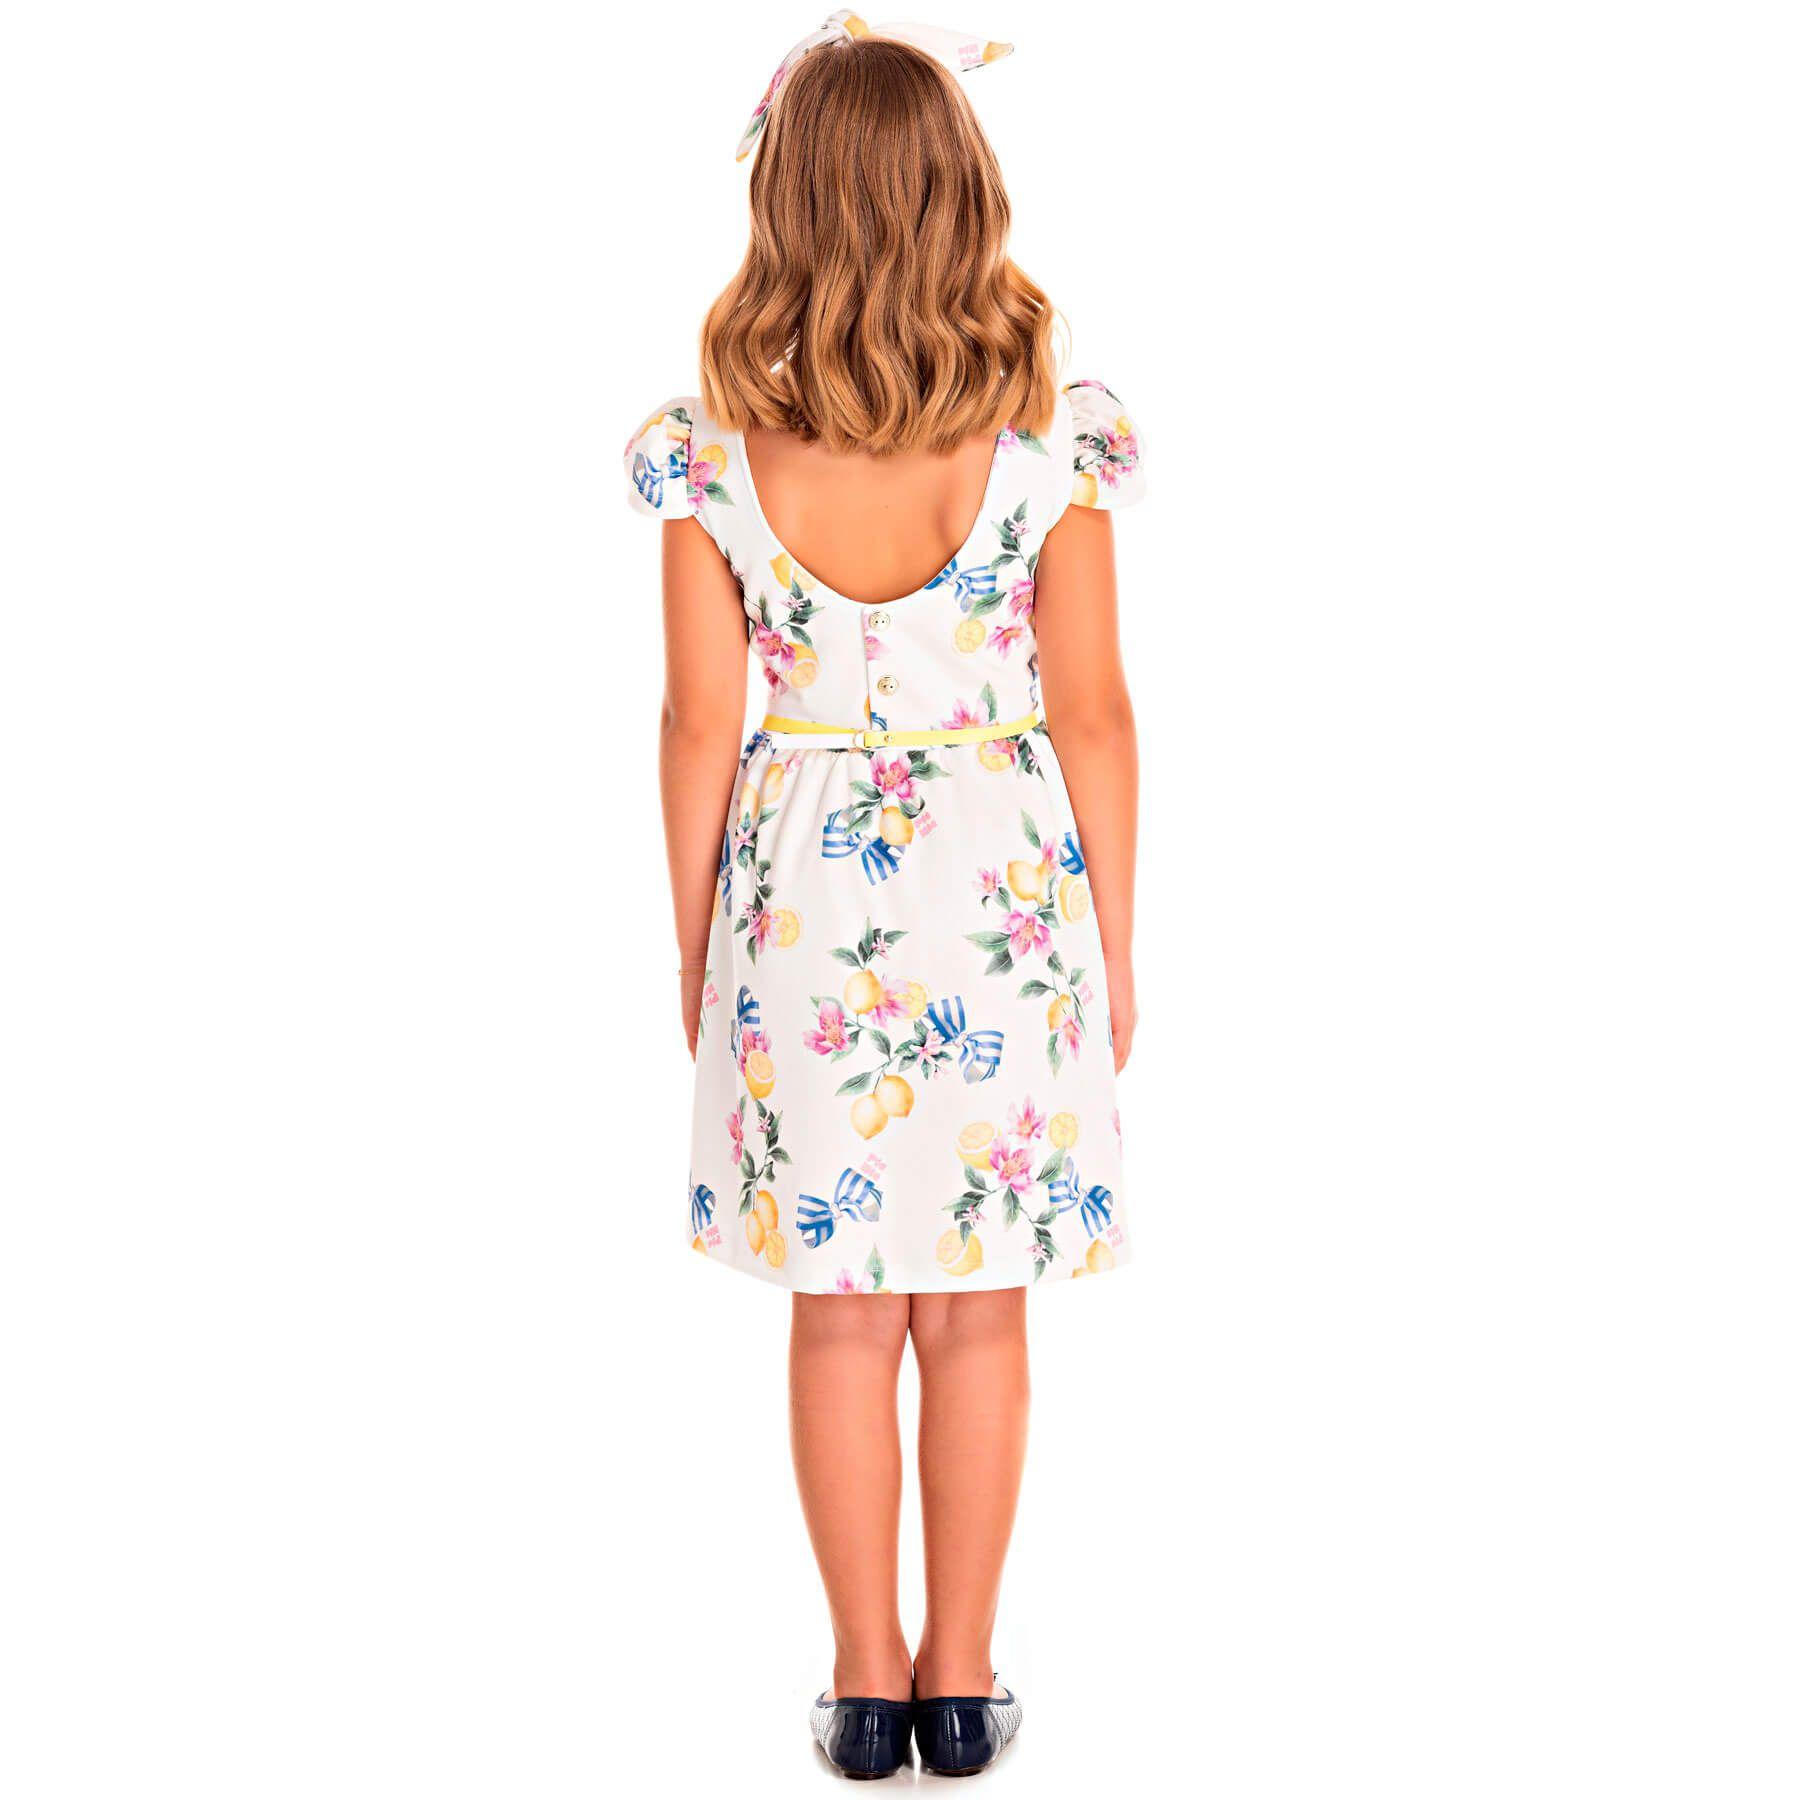 Vestido Infantil Pic Nic em Jacquard